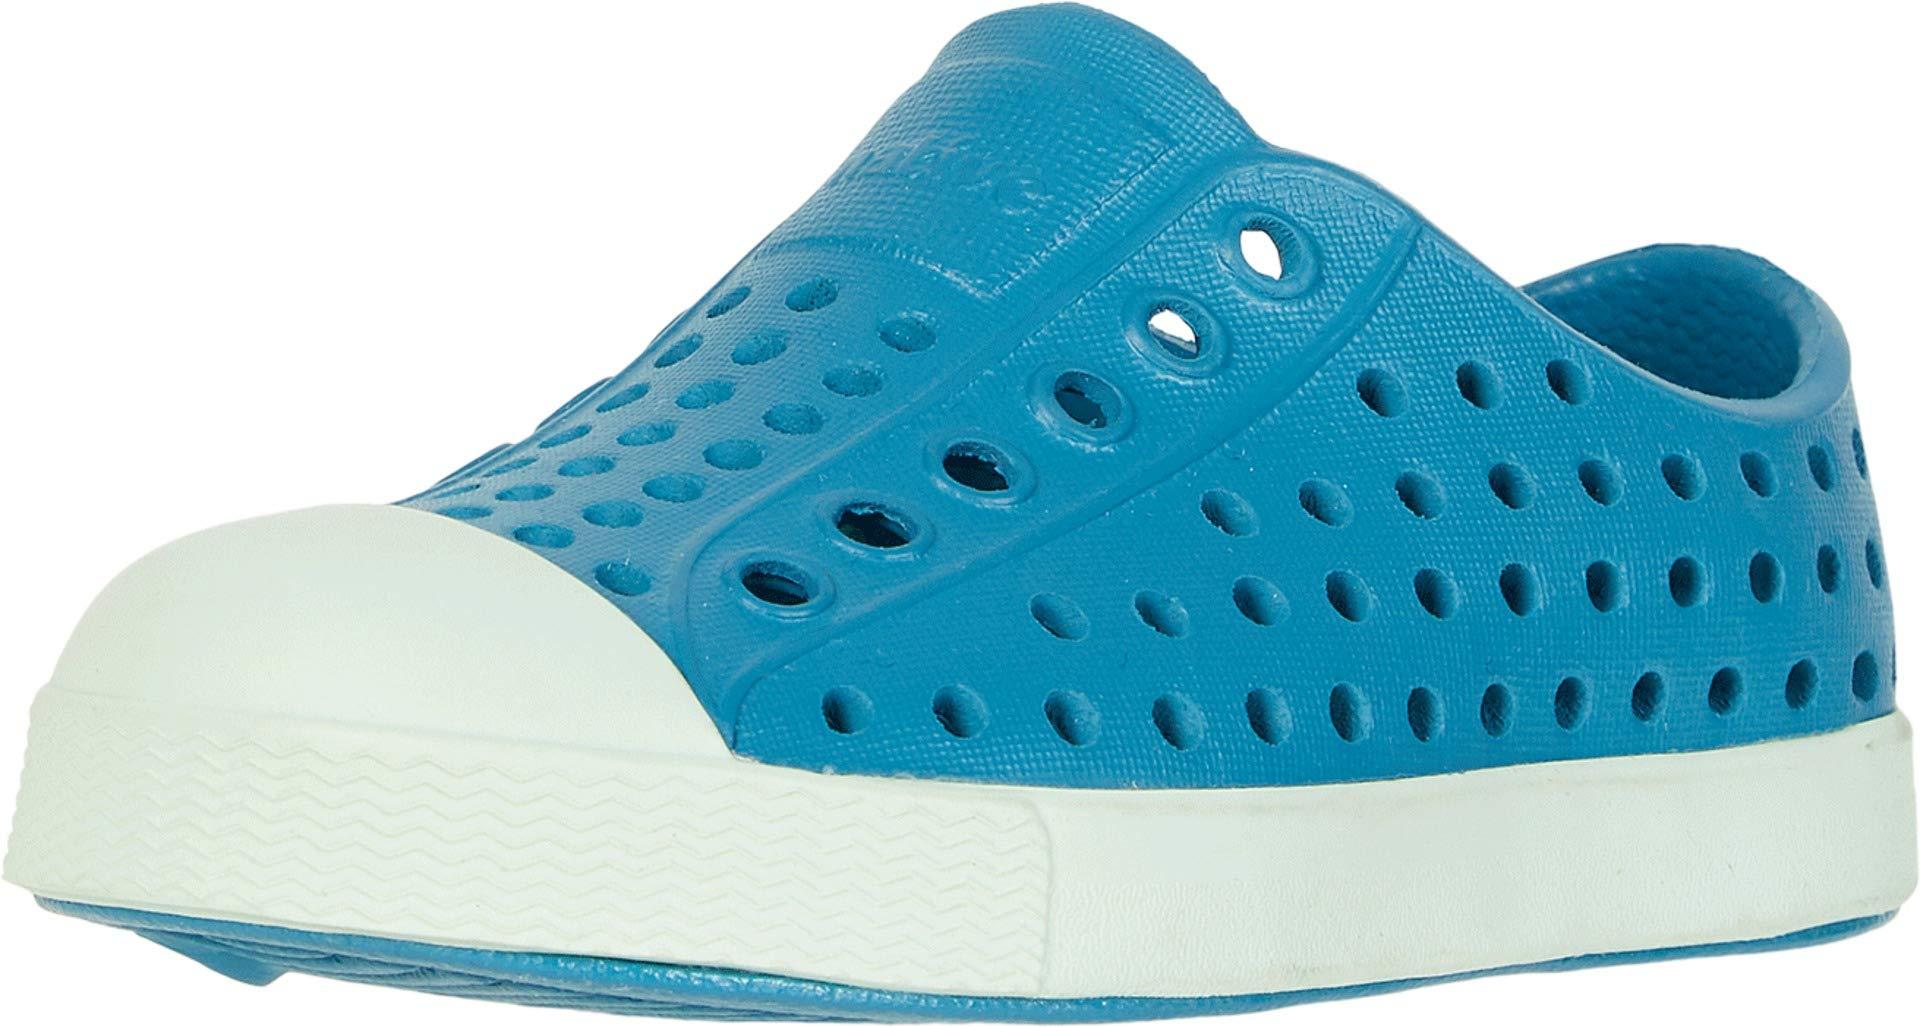 Native Kids Shoes Unisex Jefferson (Toddler/Little Kid) Depth Blue/Celtuse Green 13 M US Little Kid by Native